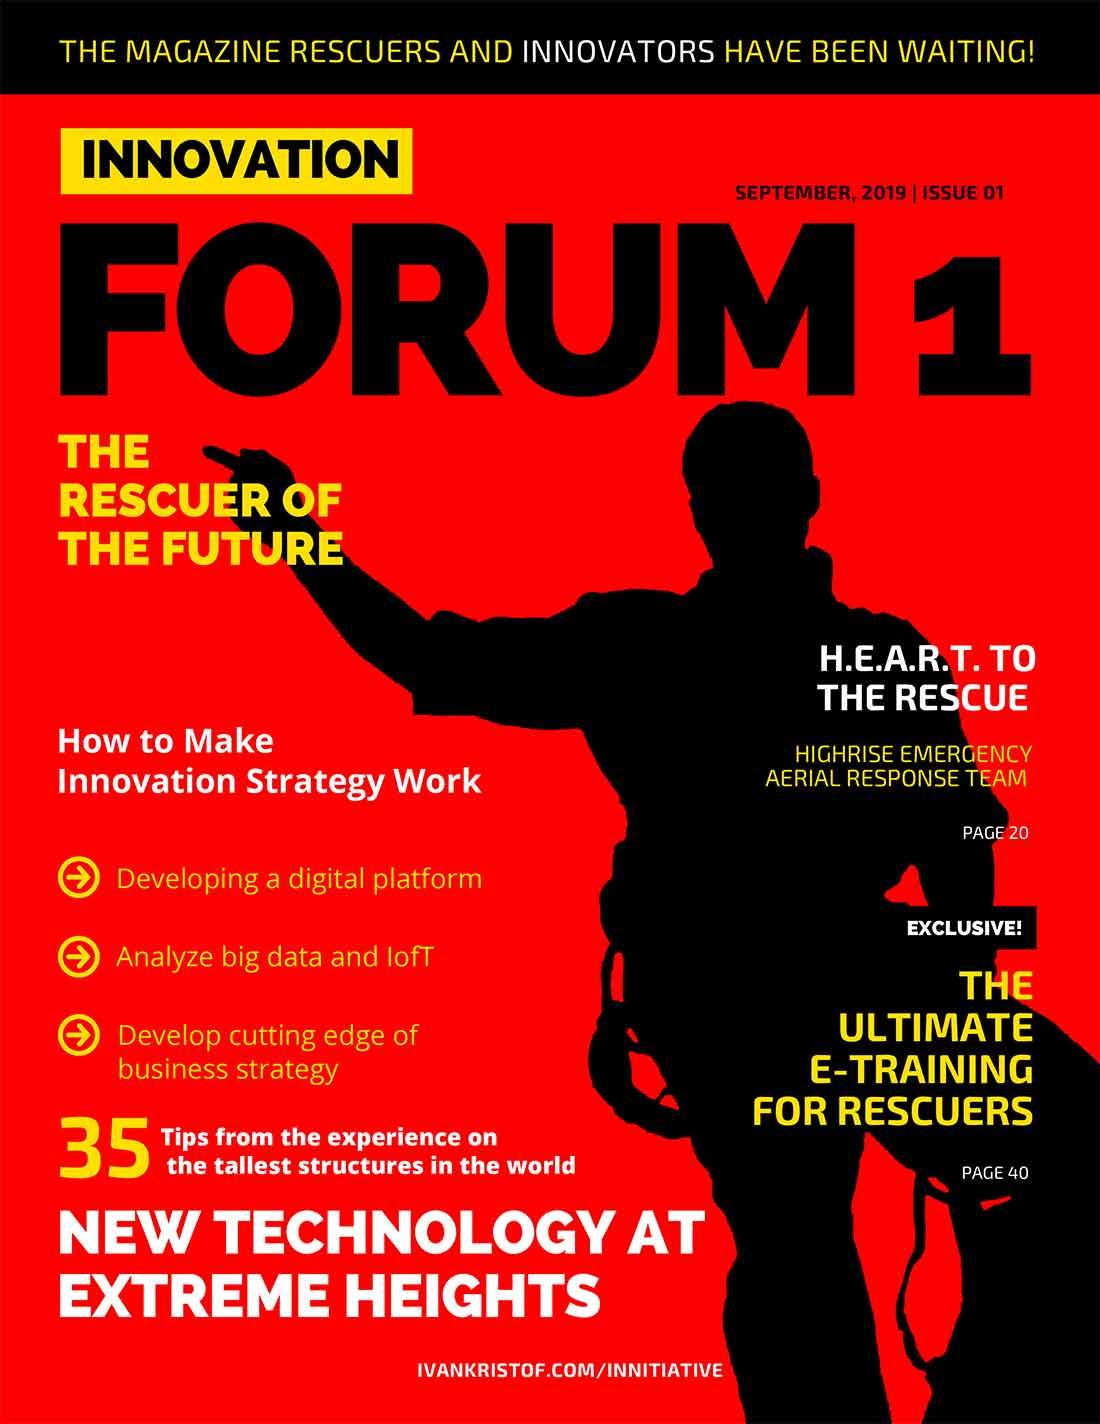 The Innovation Forum Magazine